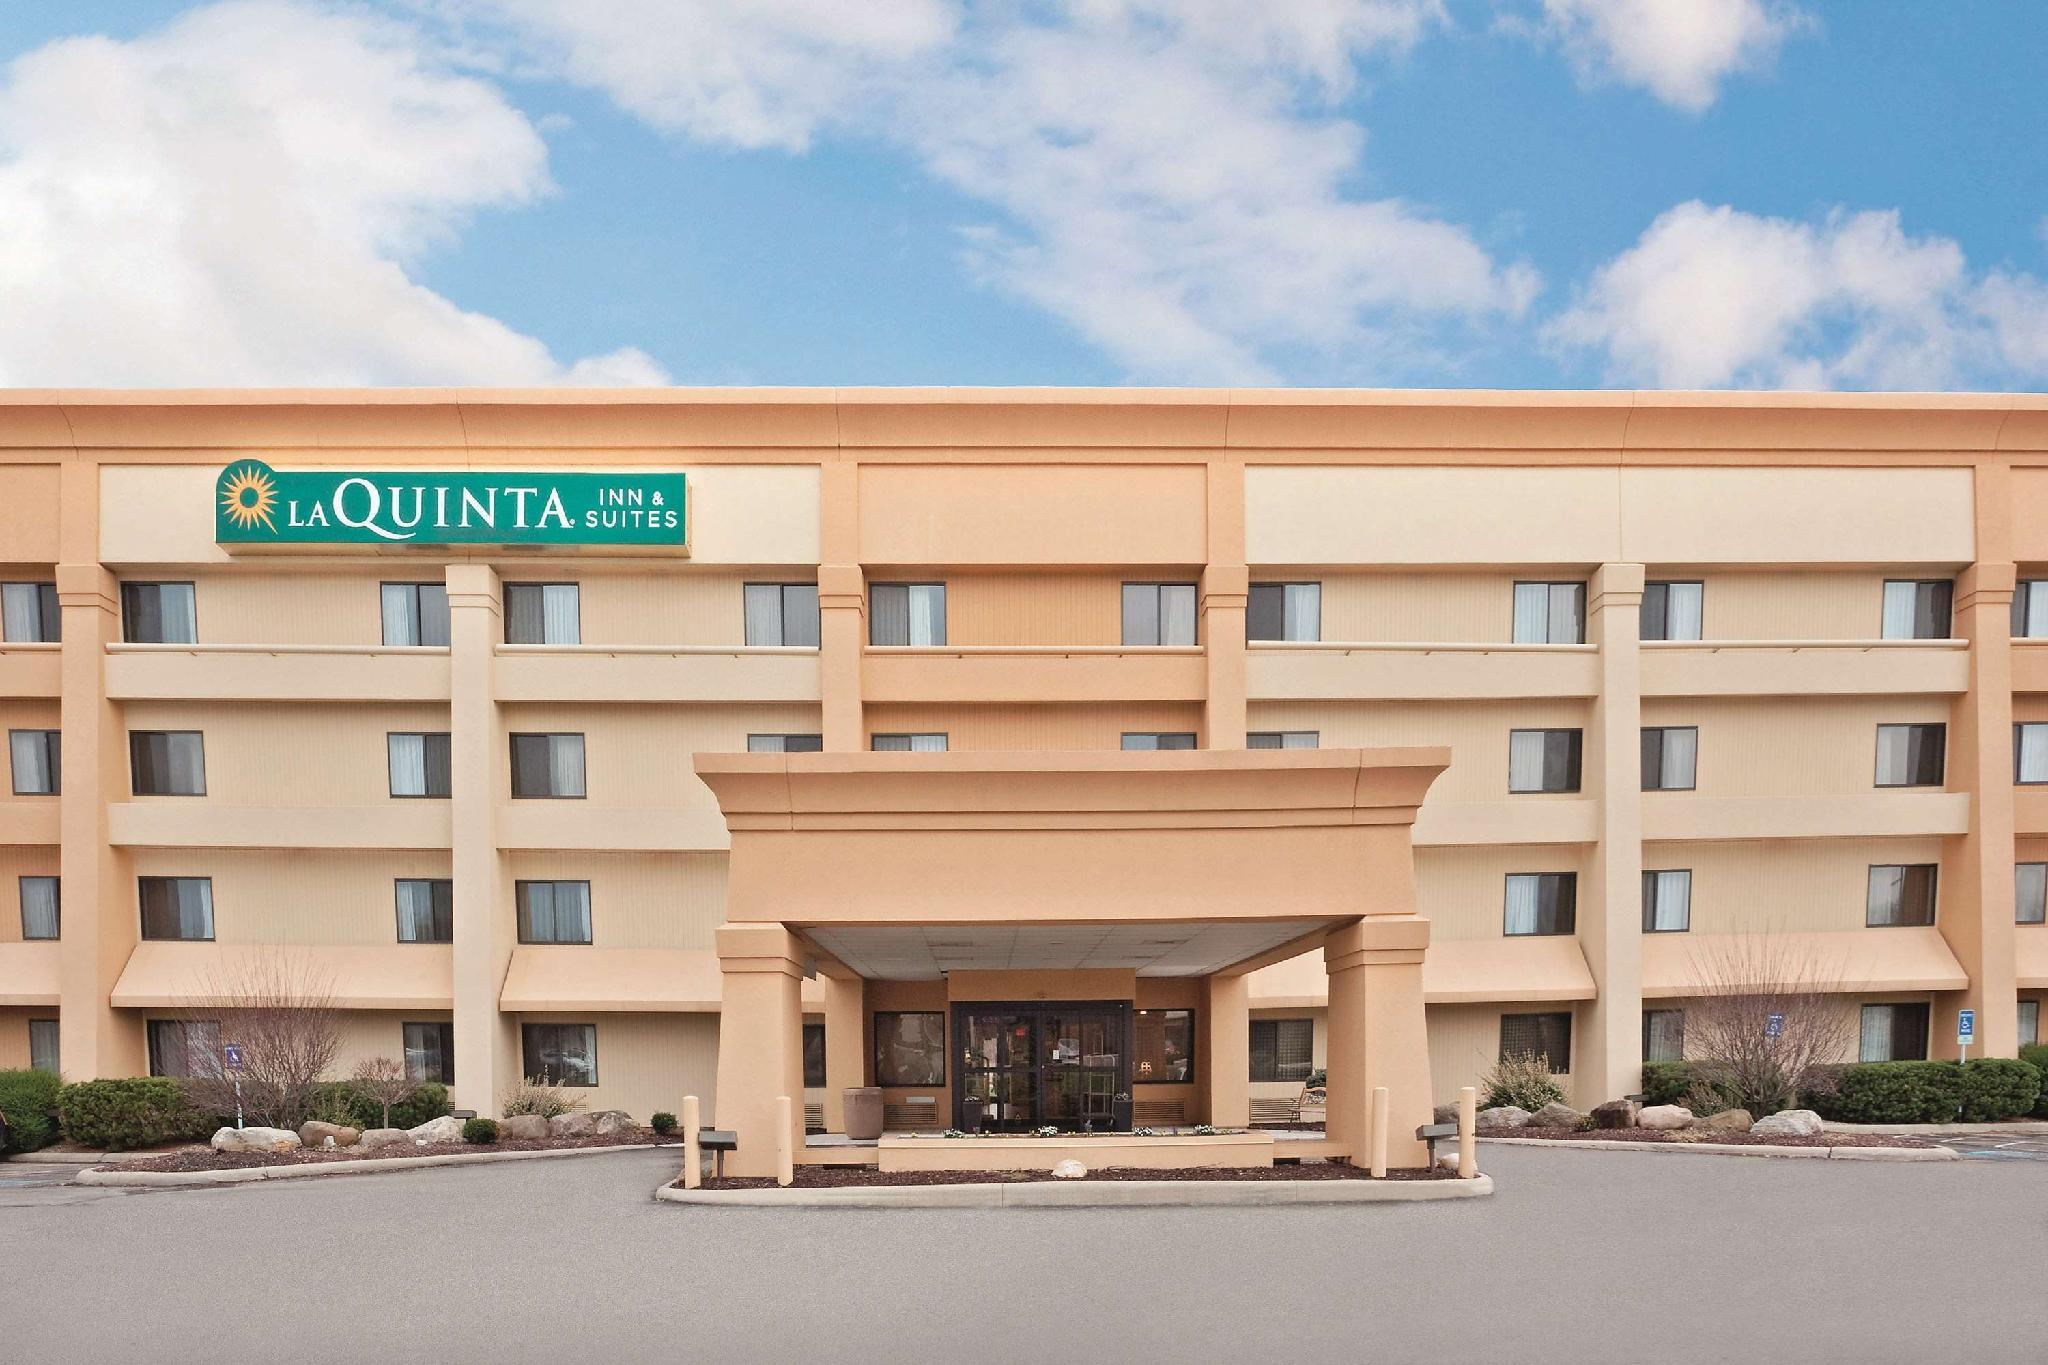 La Quinta Inn & Suites By Wyndham Mansfield OH